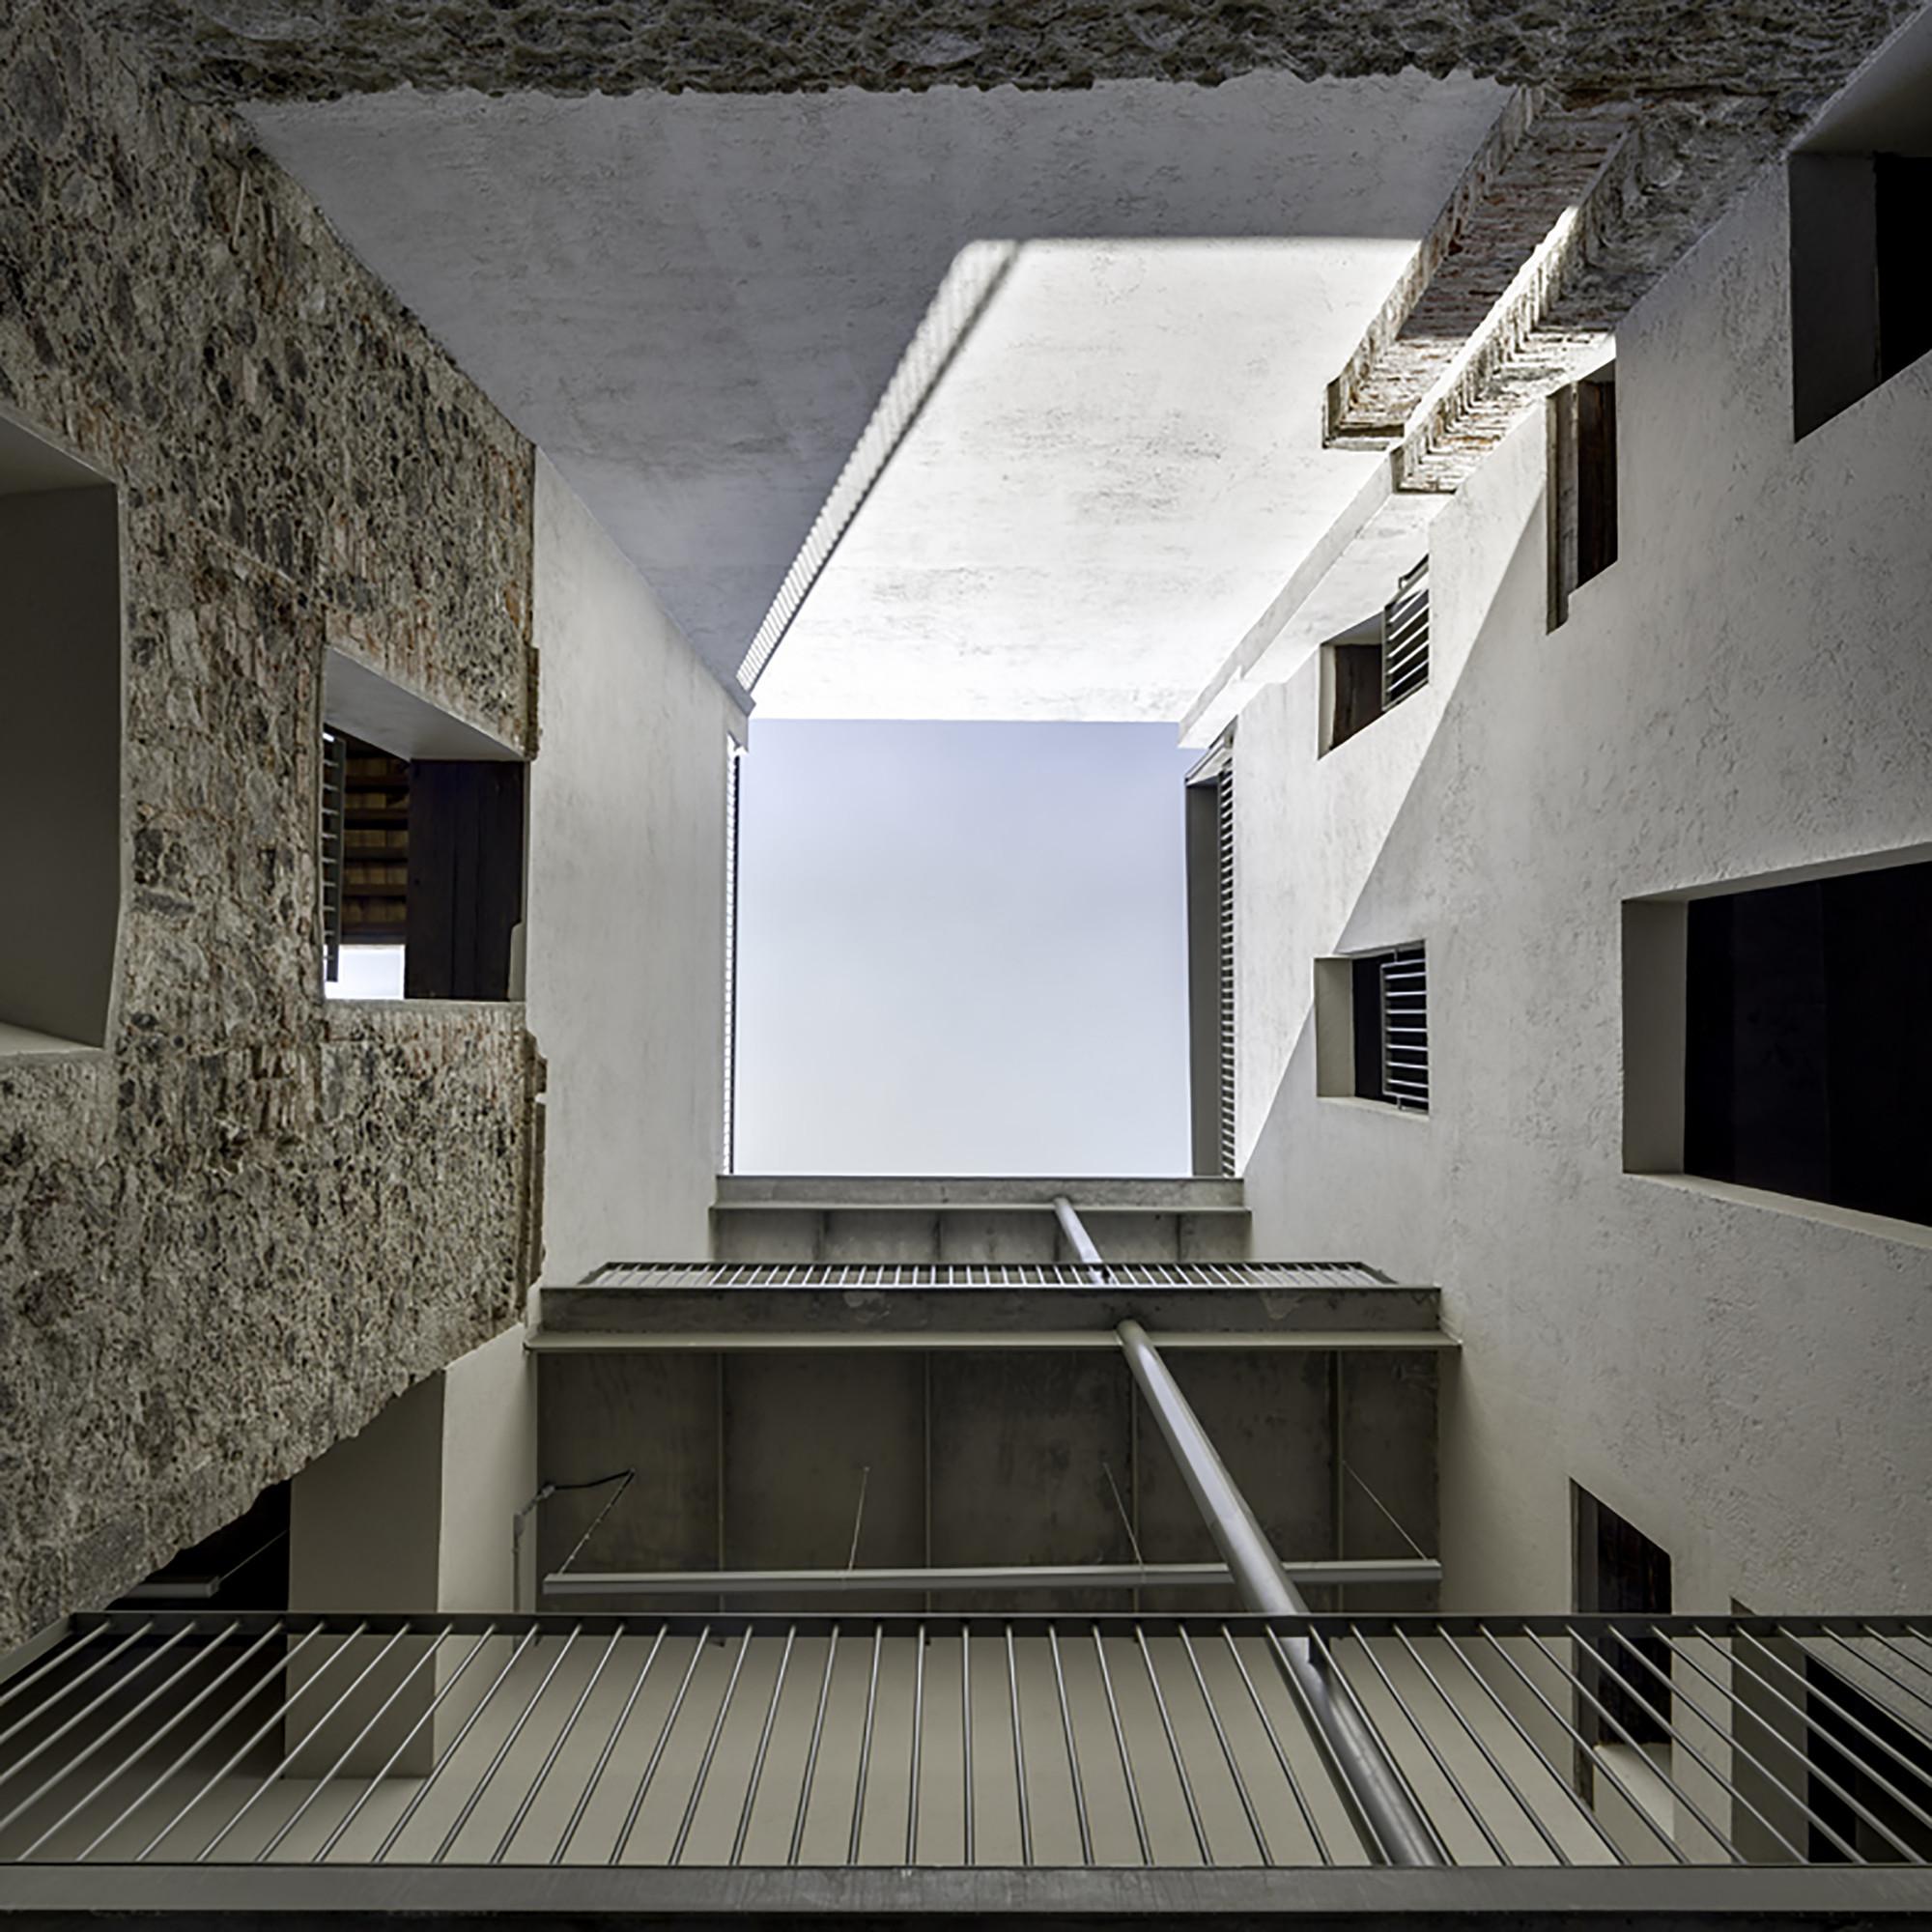 Donceles 54 / CC Arquitectos, Cortesia de CC Arquitectos